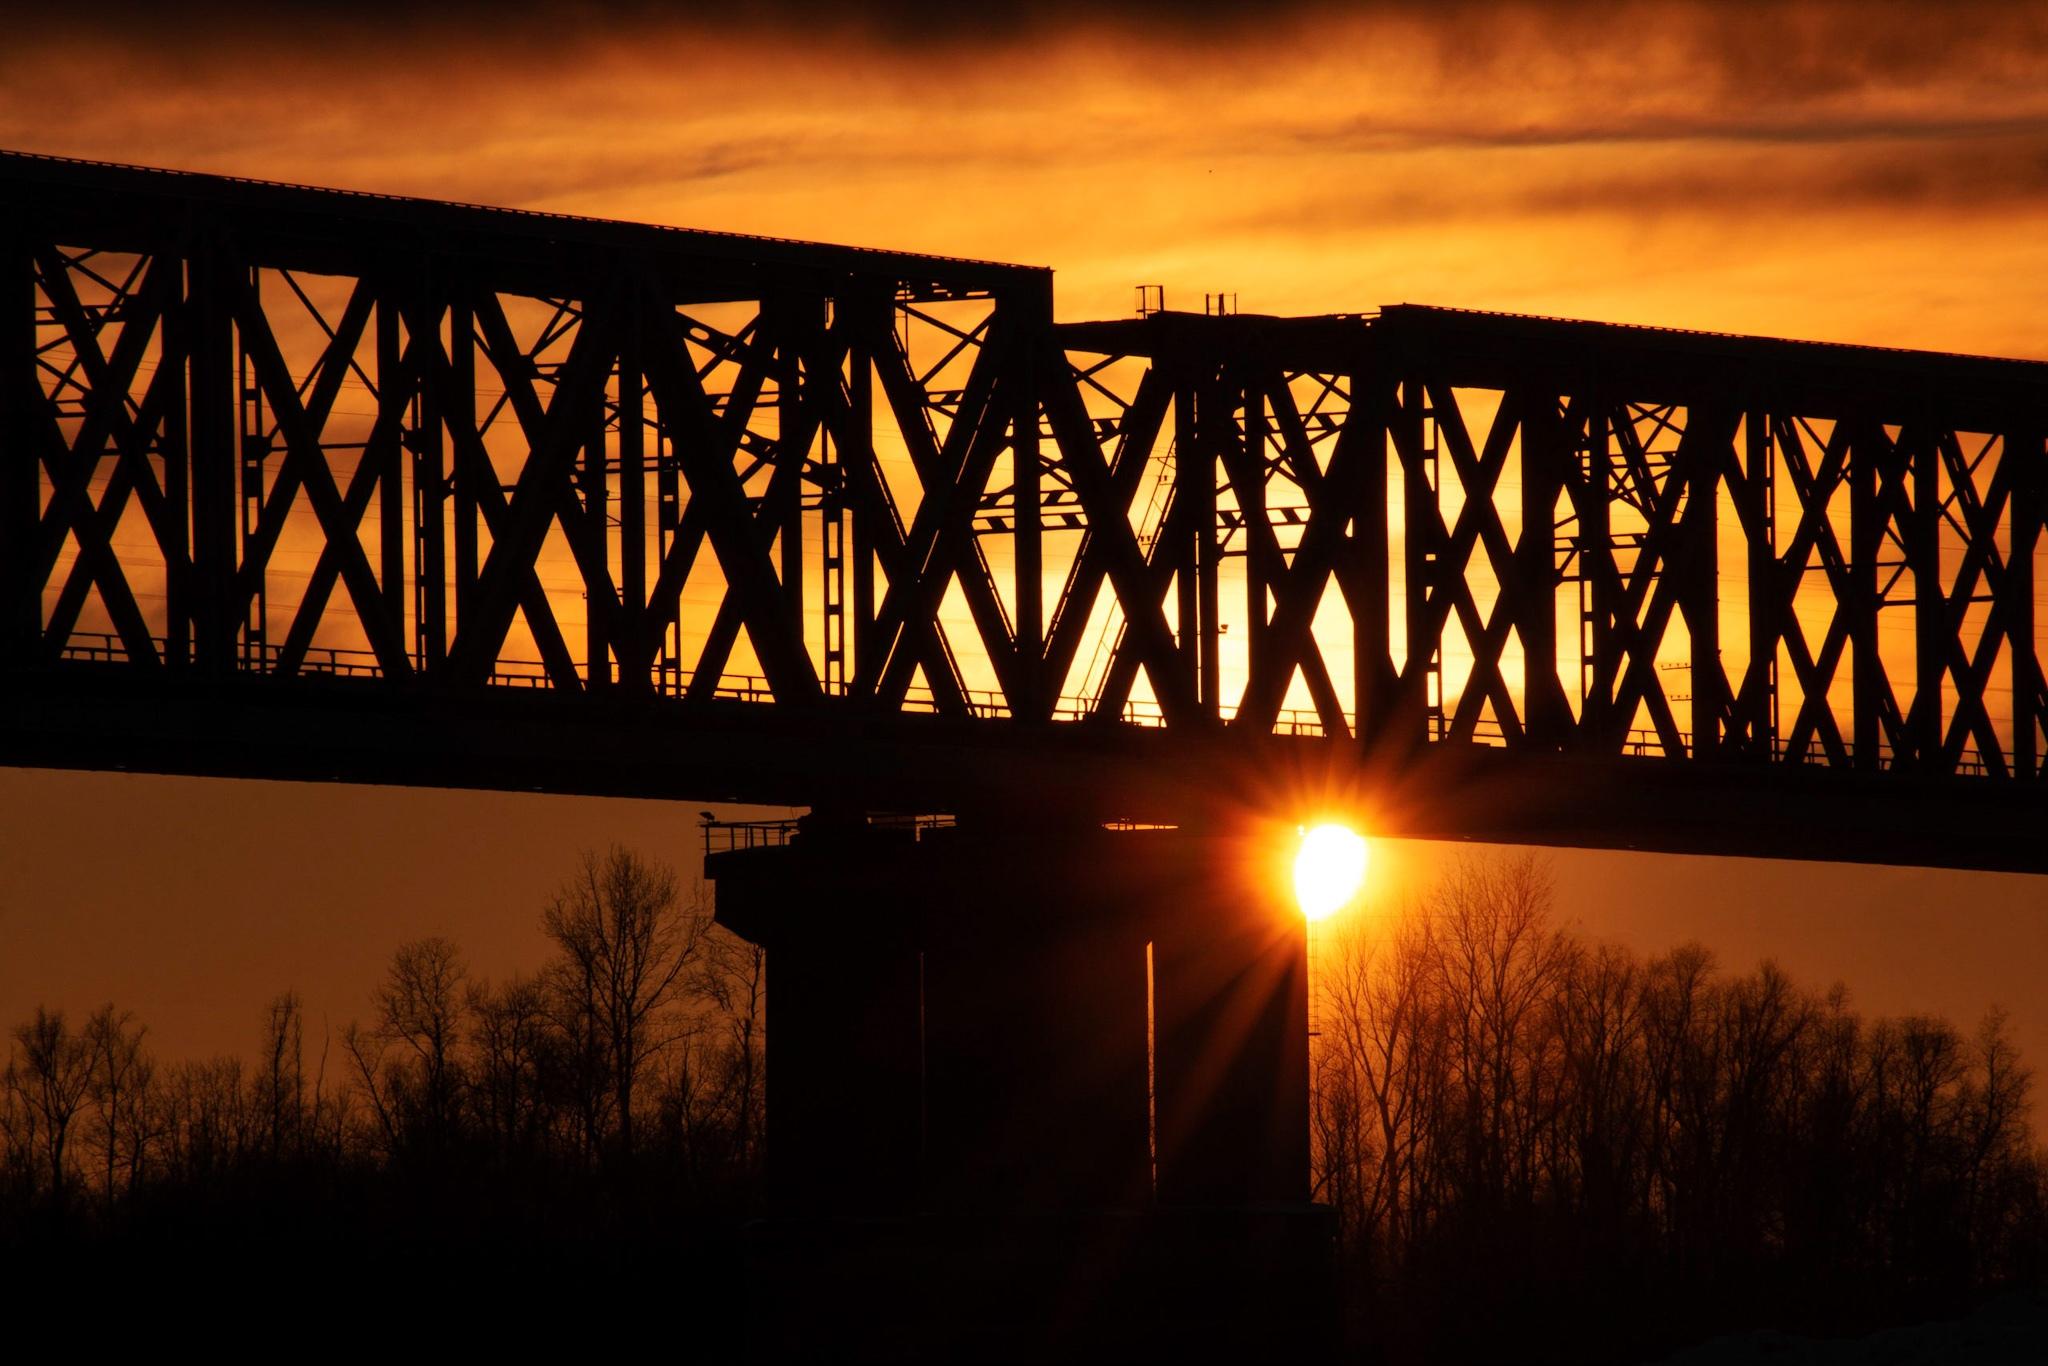 ЖД мост через Иртыш